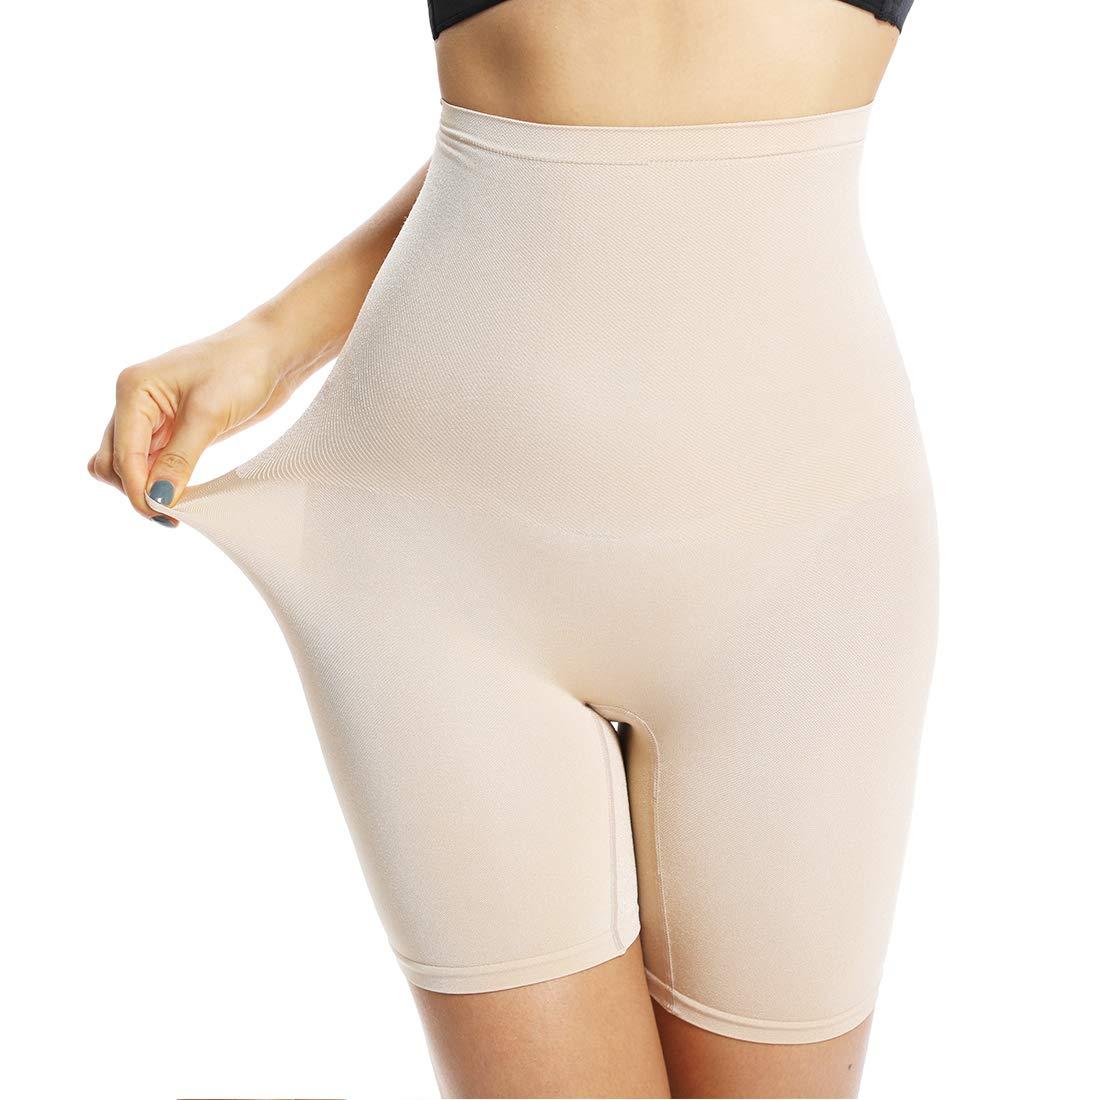 Women's Thigh Slimmer Shapewear Panties Anti Chafing Slip Shorts for Under Dress Seamless Girdle Body Shaper